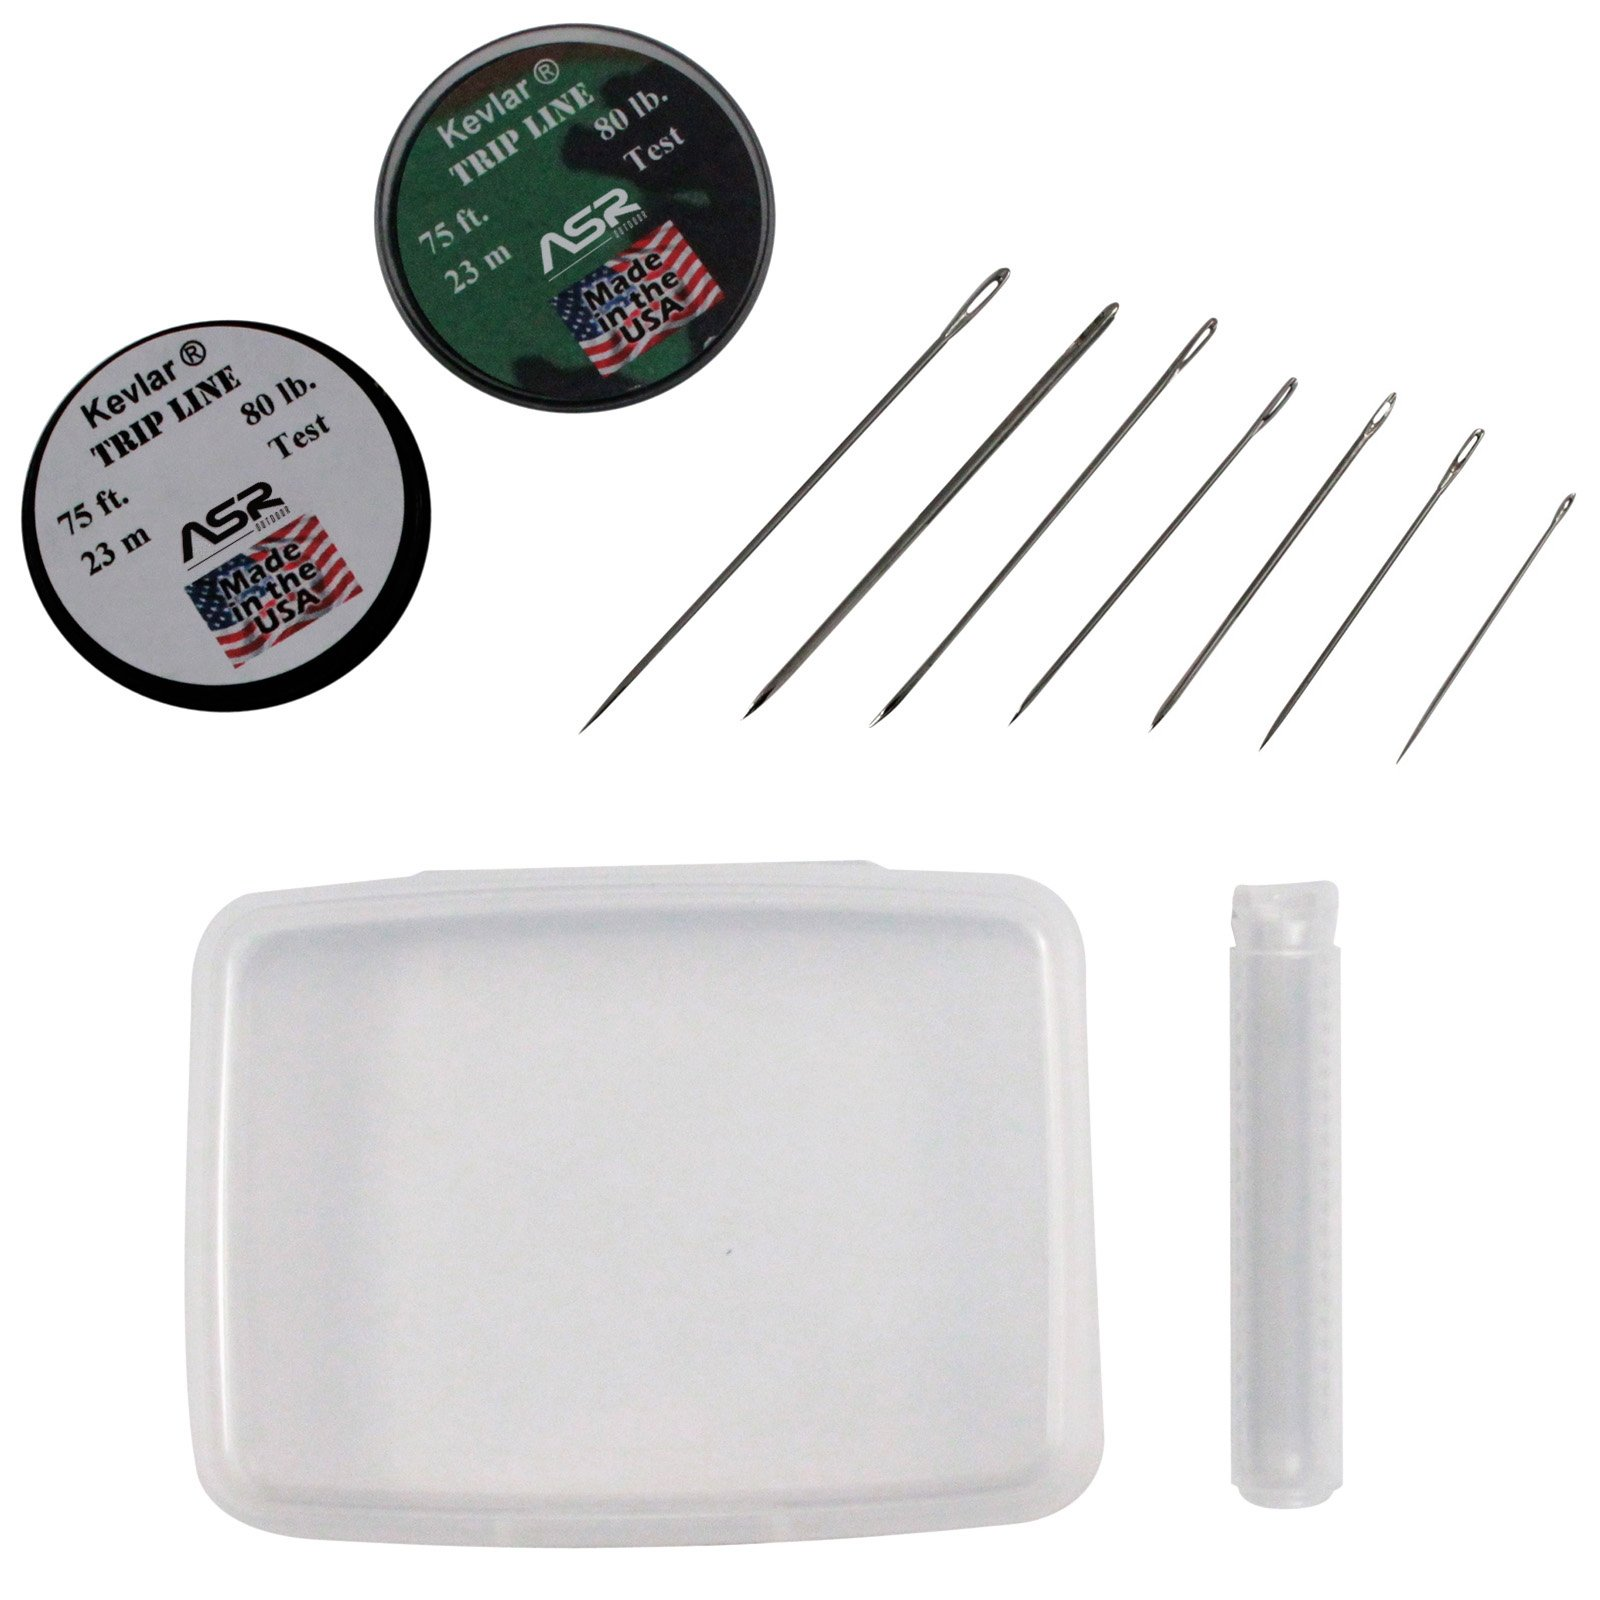 ASR Outdoor 10pc Survival Sewing Kit Rapid Deployment Kevlar Steel Needles